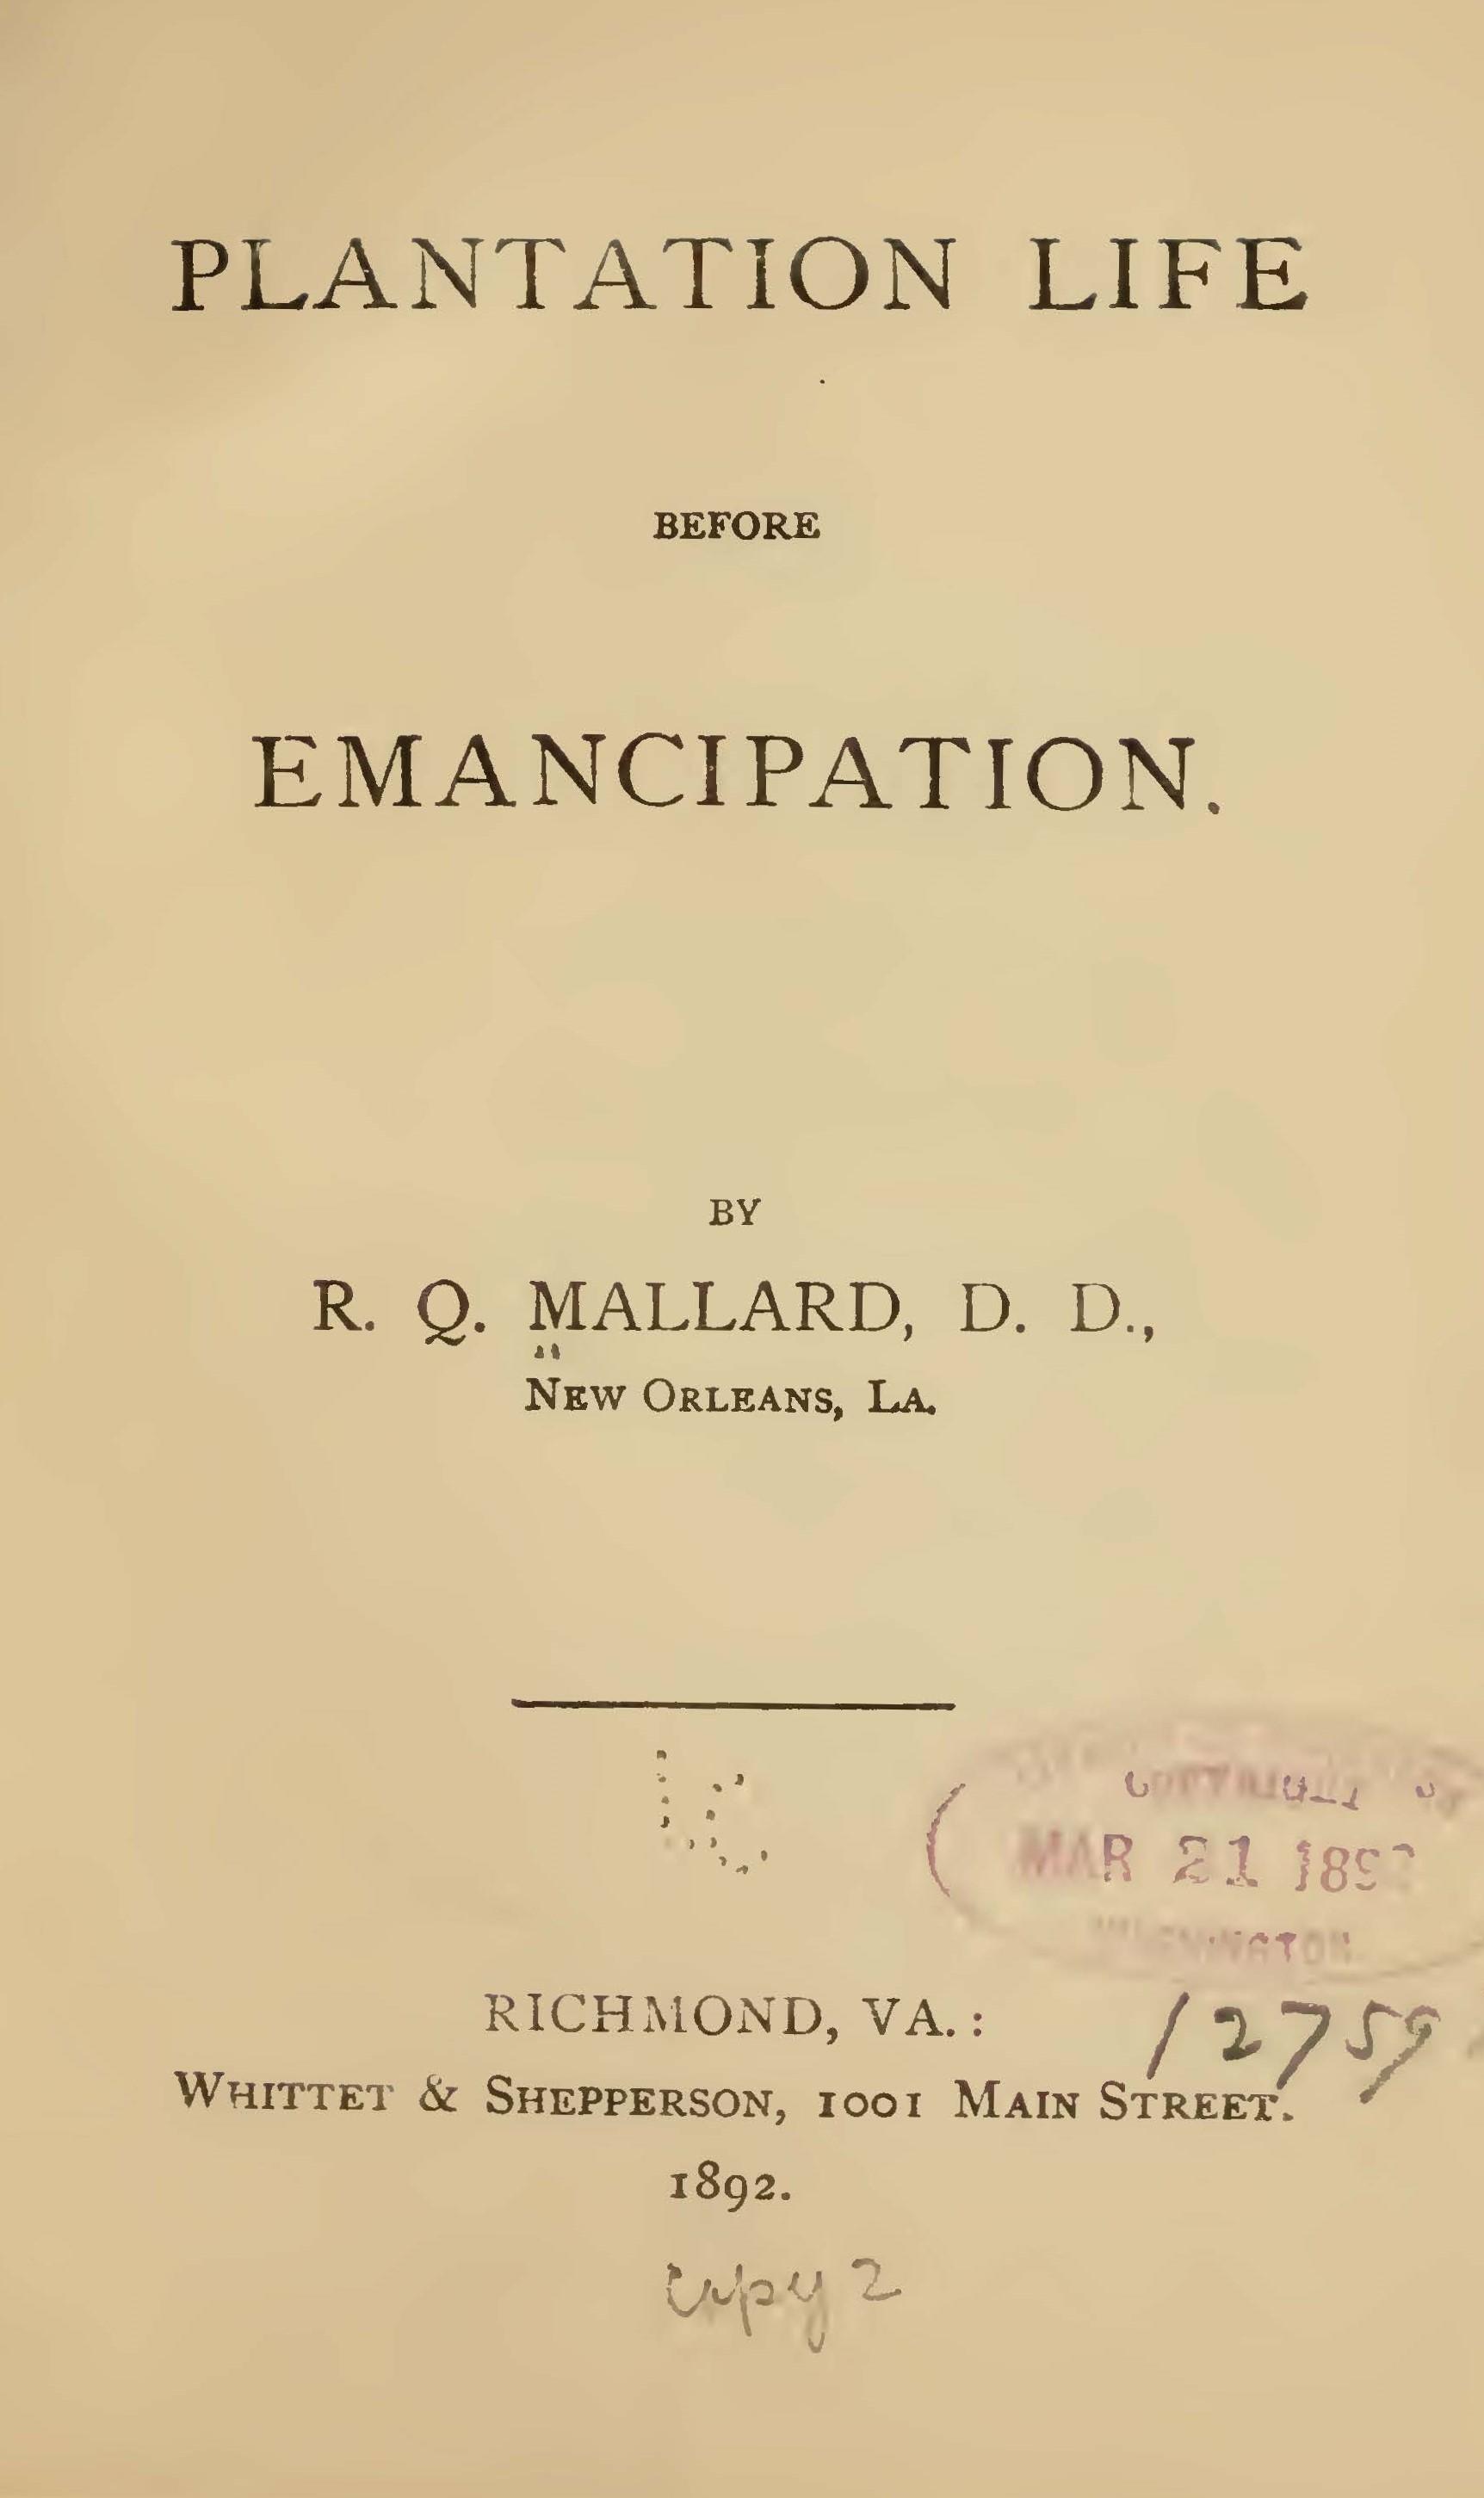 Mallard, R. Q. - Plantation Life Before Emancipation.jpg